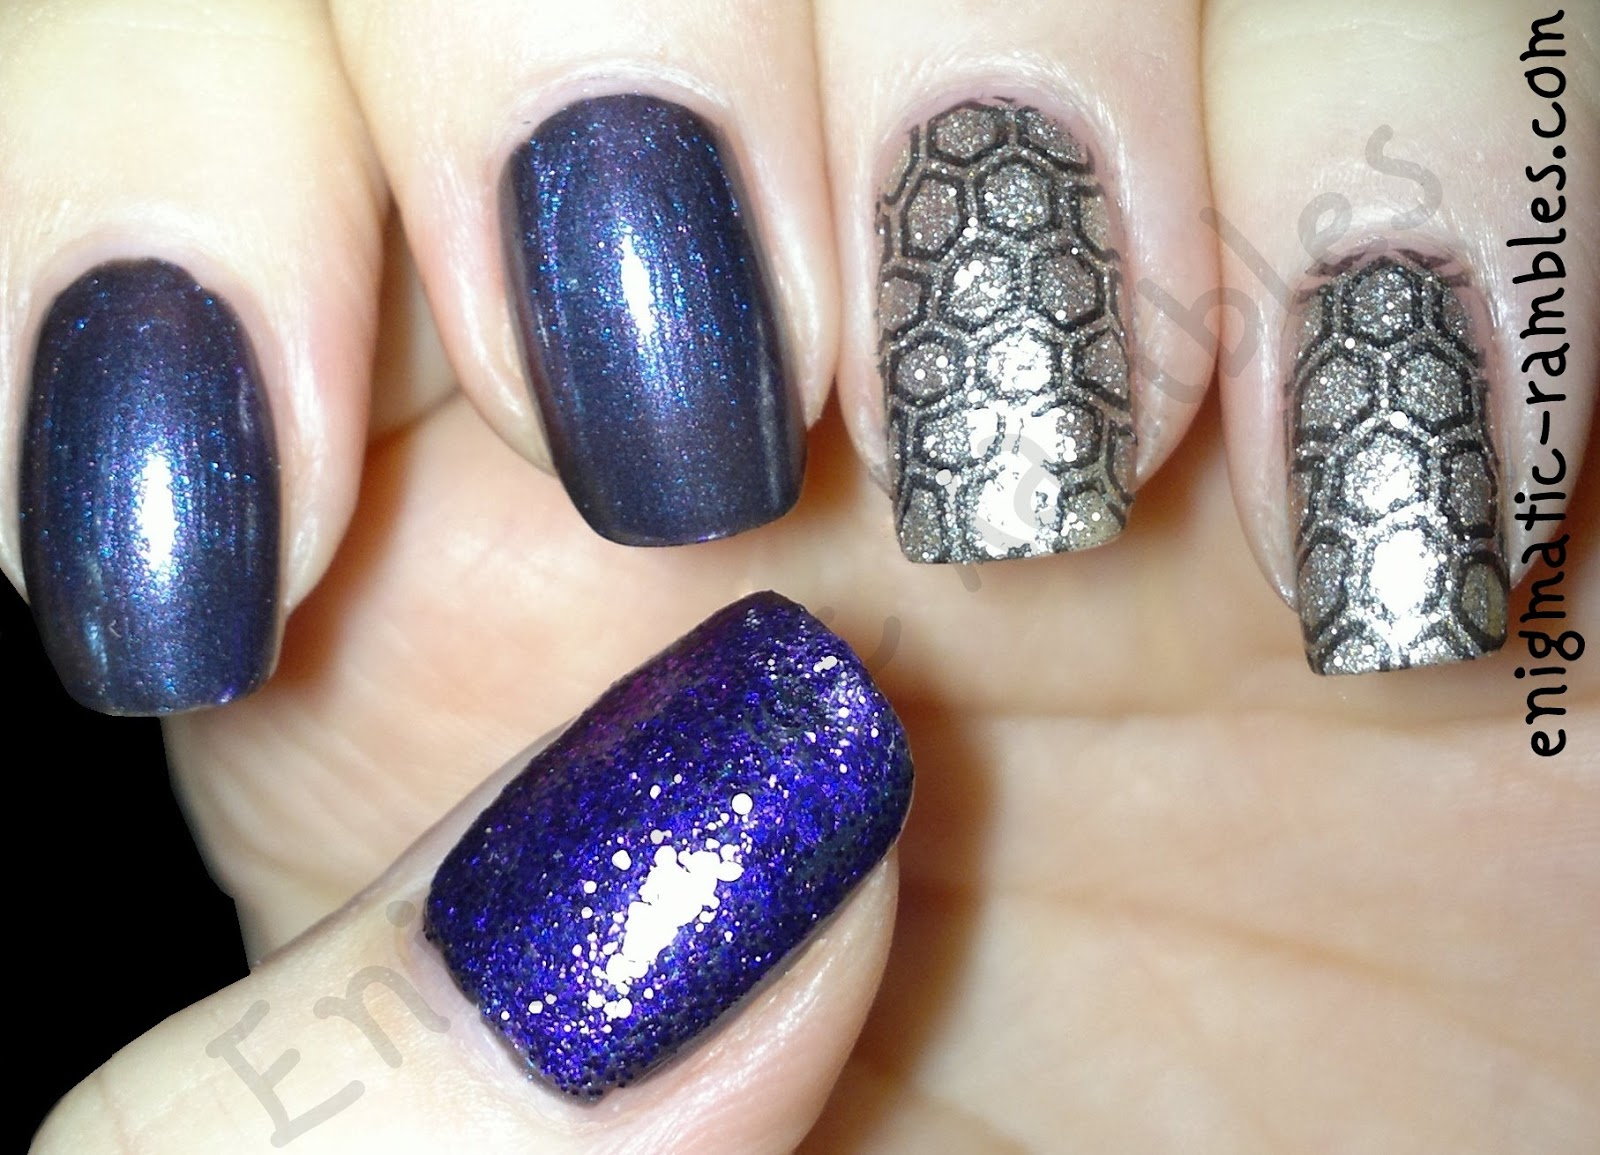 skittle-nails-stargazer-142-essie-beyond-cozy-models-own-purple-haze-bundle-monster-422-BM422